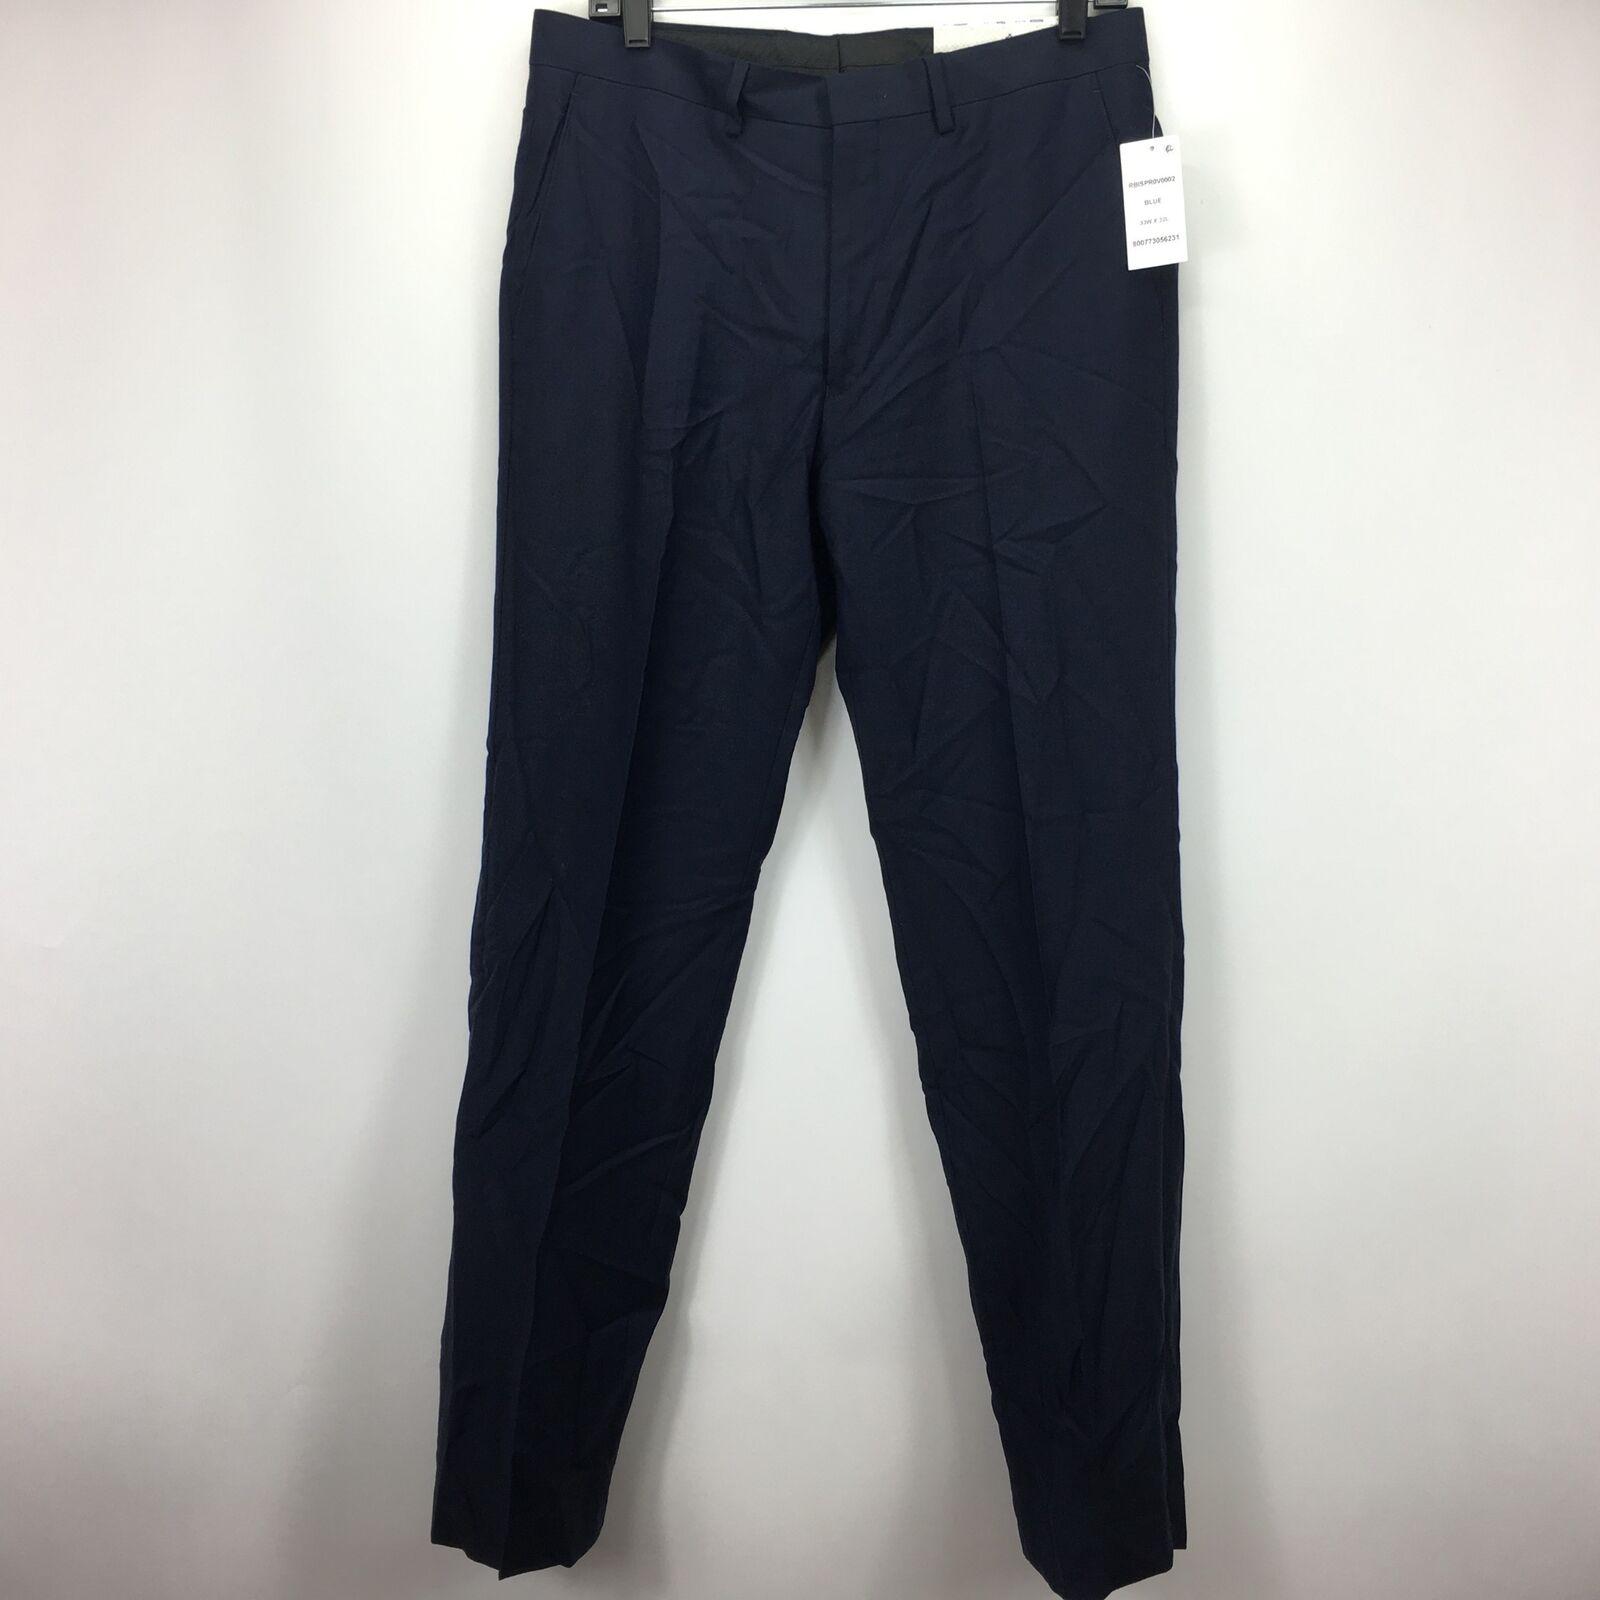 Ryan Seacrest Distinction Mens Modern Slim-Fit Dress Pants bluee 33x32